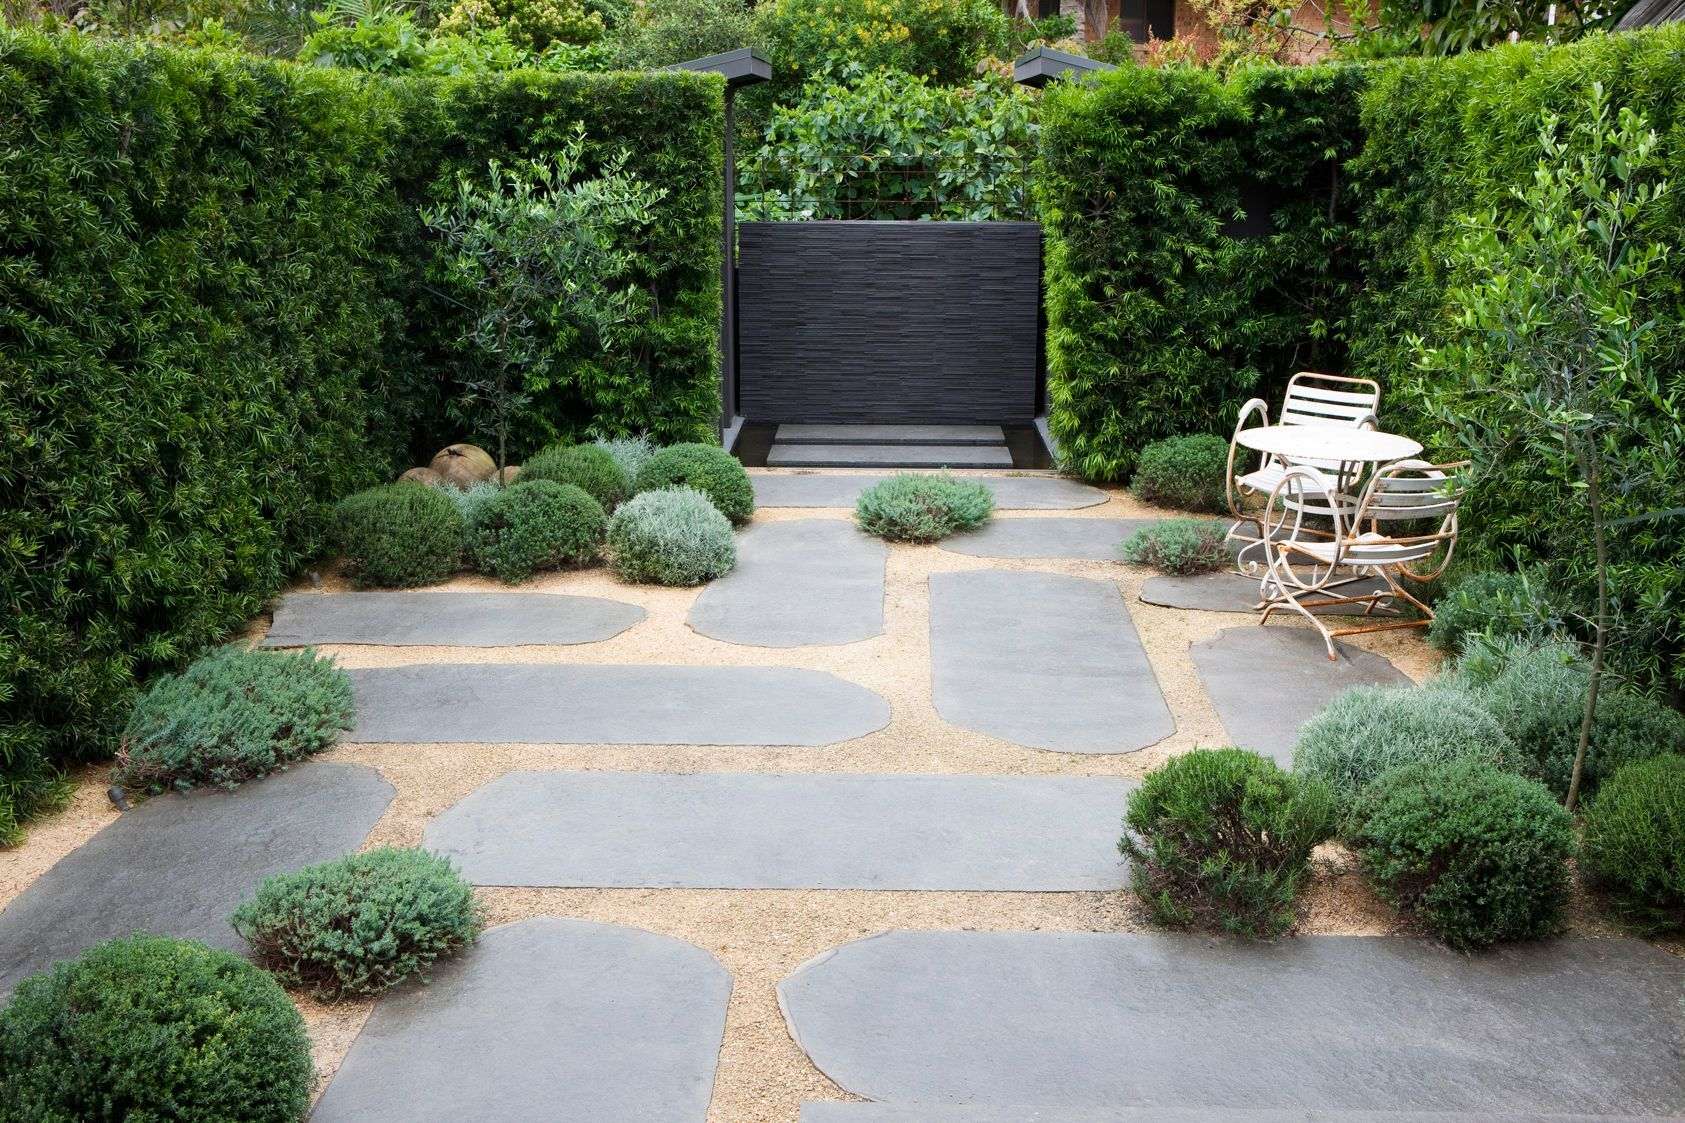 Peter Fudge Classic French Garden Landscape Design And Installation Garden Landscape Design Modern Landscaping Landscape Design